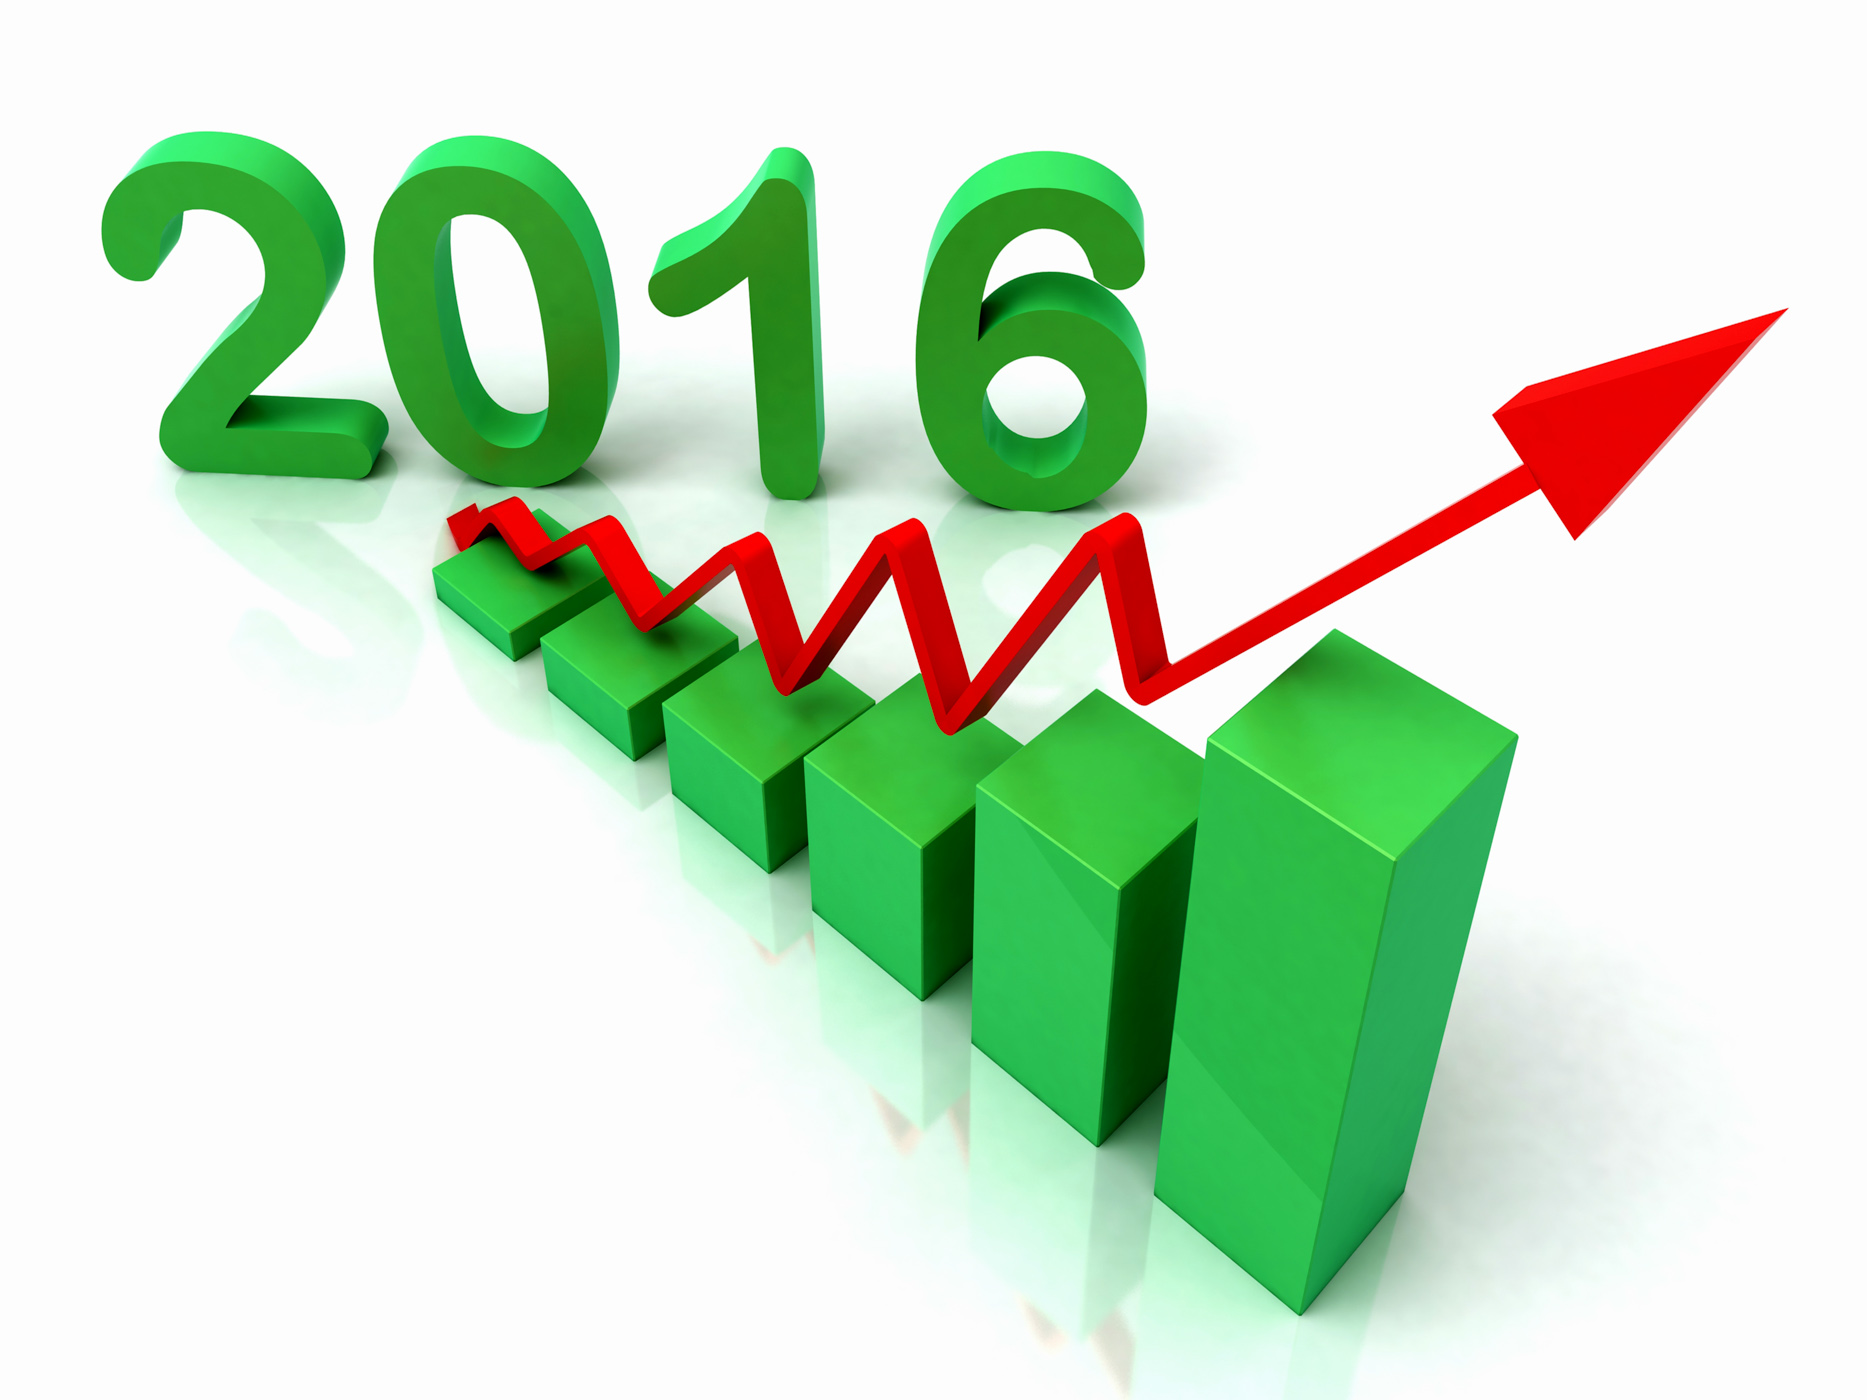 2016 Green Bar Chart Shows Budget, Grow, Success, Rising, Rise, HQ Photo